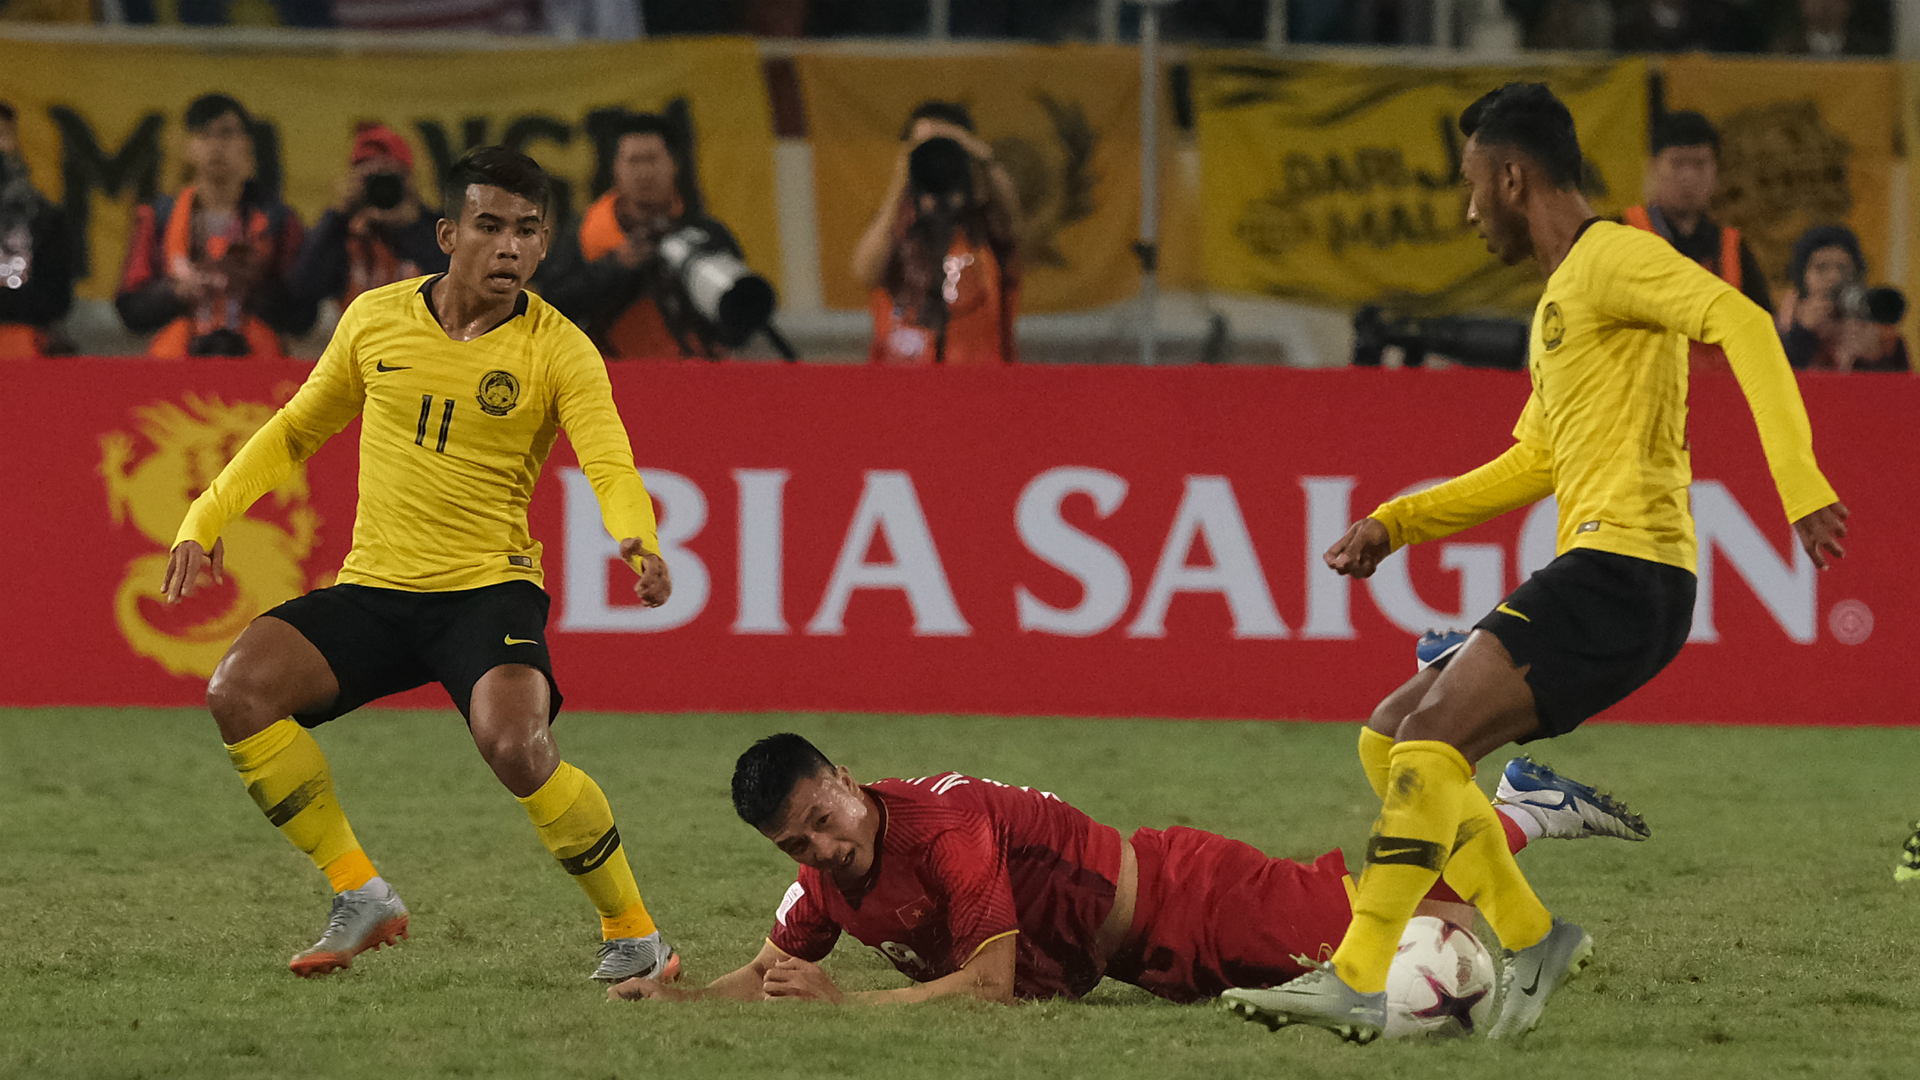 Akram Mahinan, Malaysia, 2018 AFF Suzuki Cup